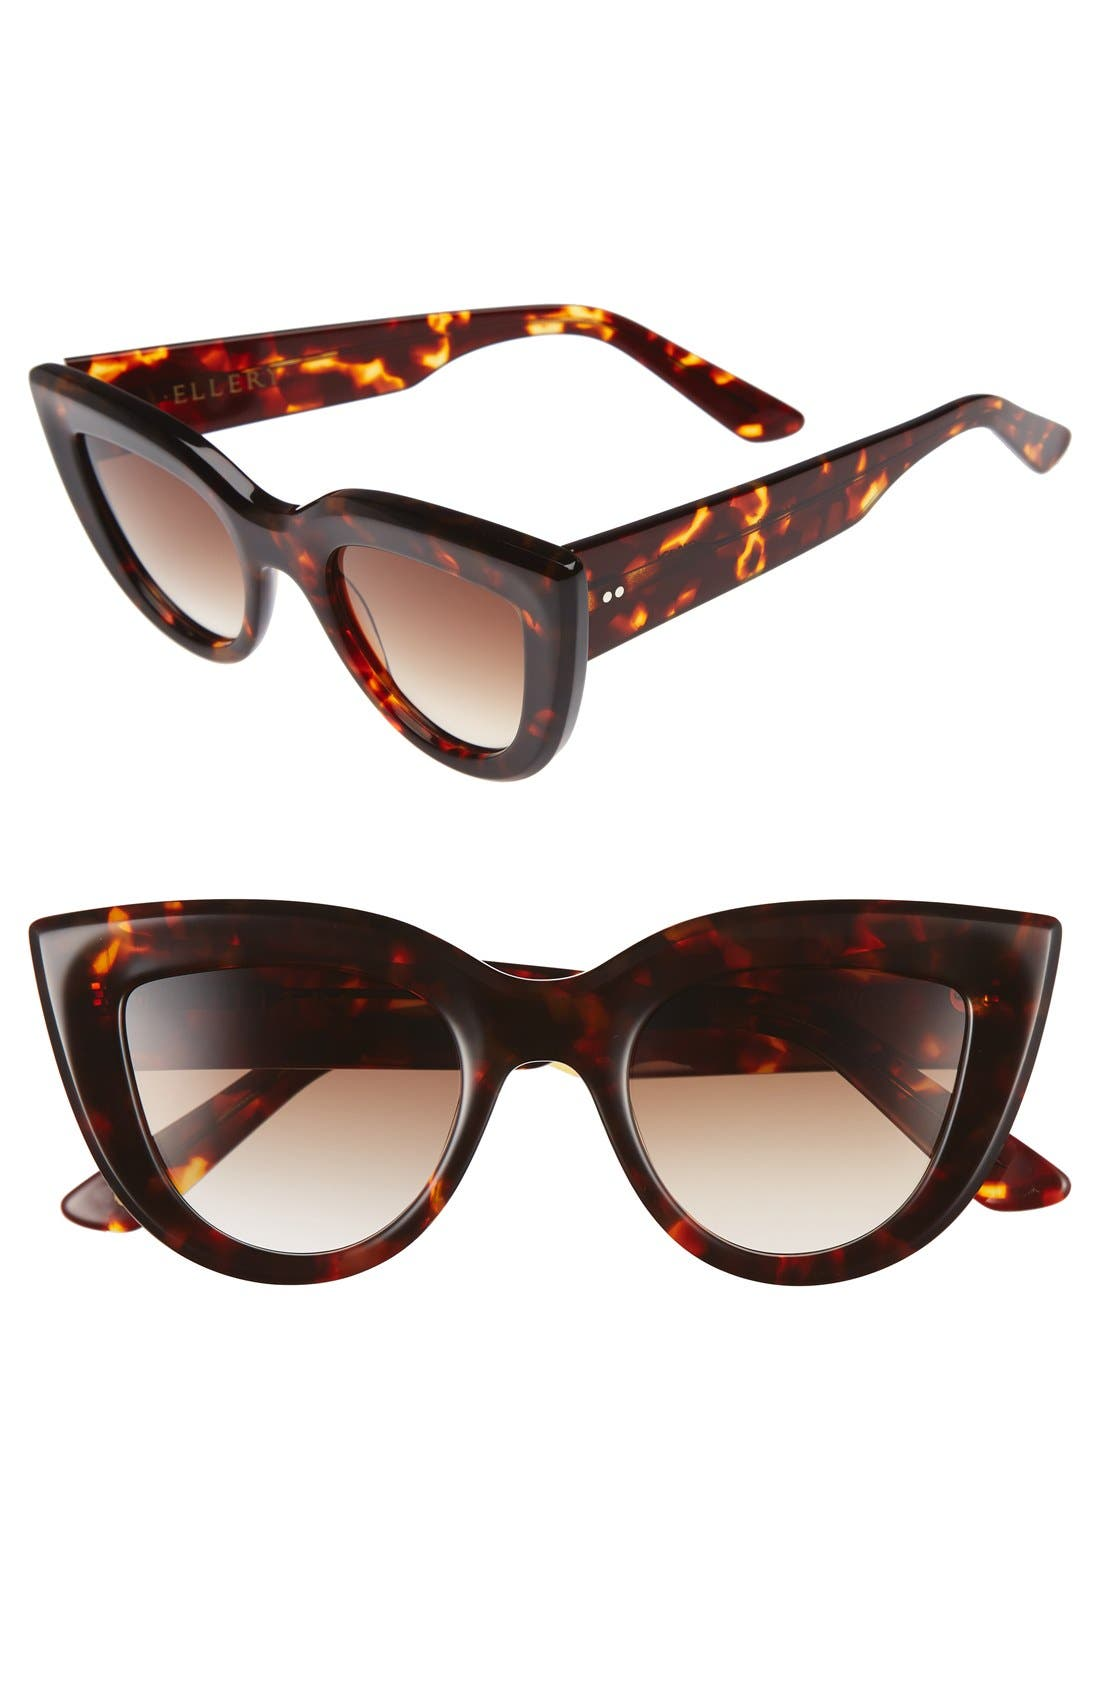 Main Image - ELLERY 'Quixote Classic' 45mm Cat Eye Sunglasses